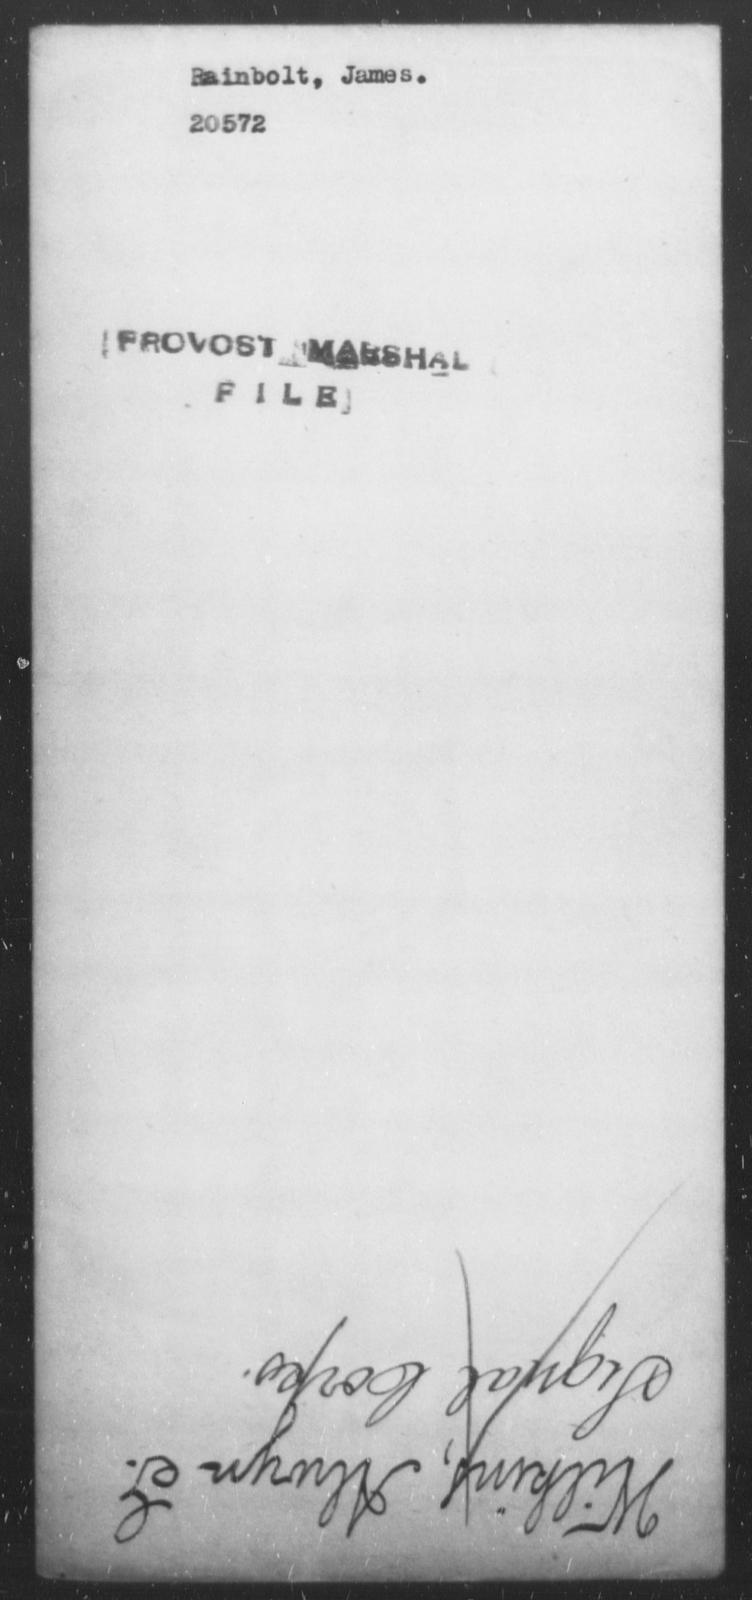 Rainbolt, James - State: [Blank] - Year: [Blank]